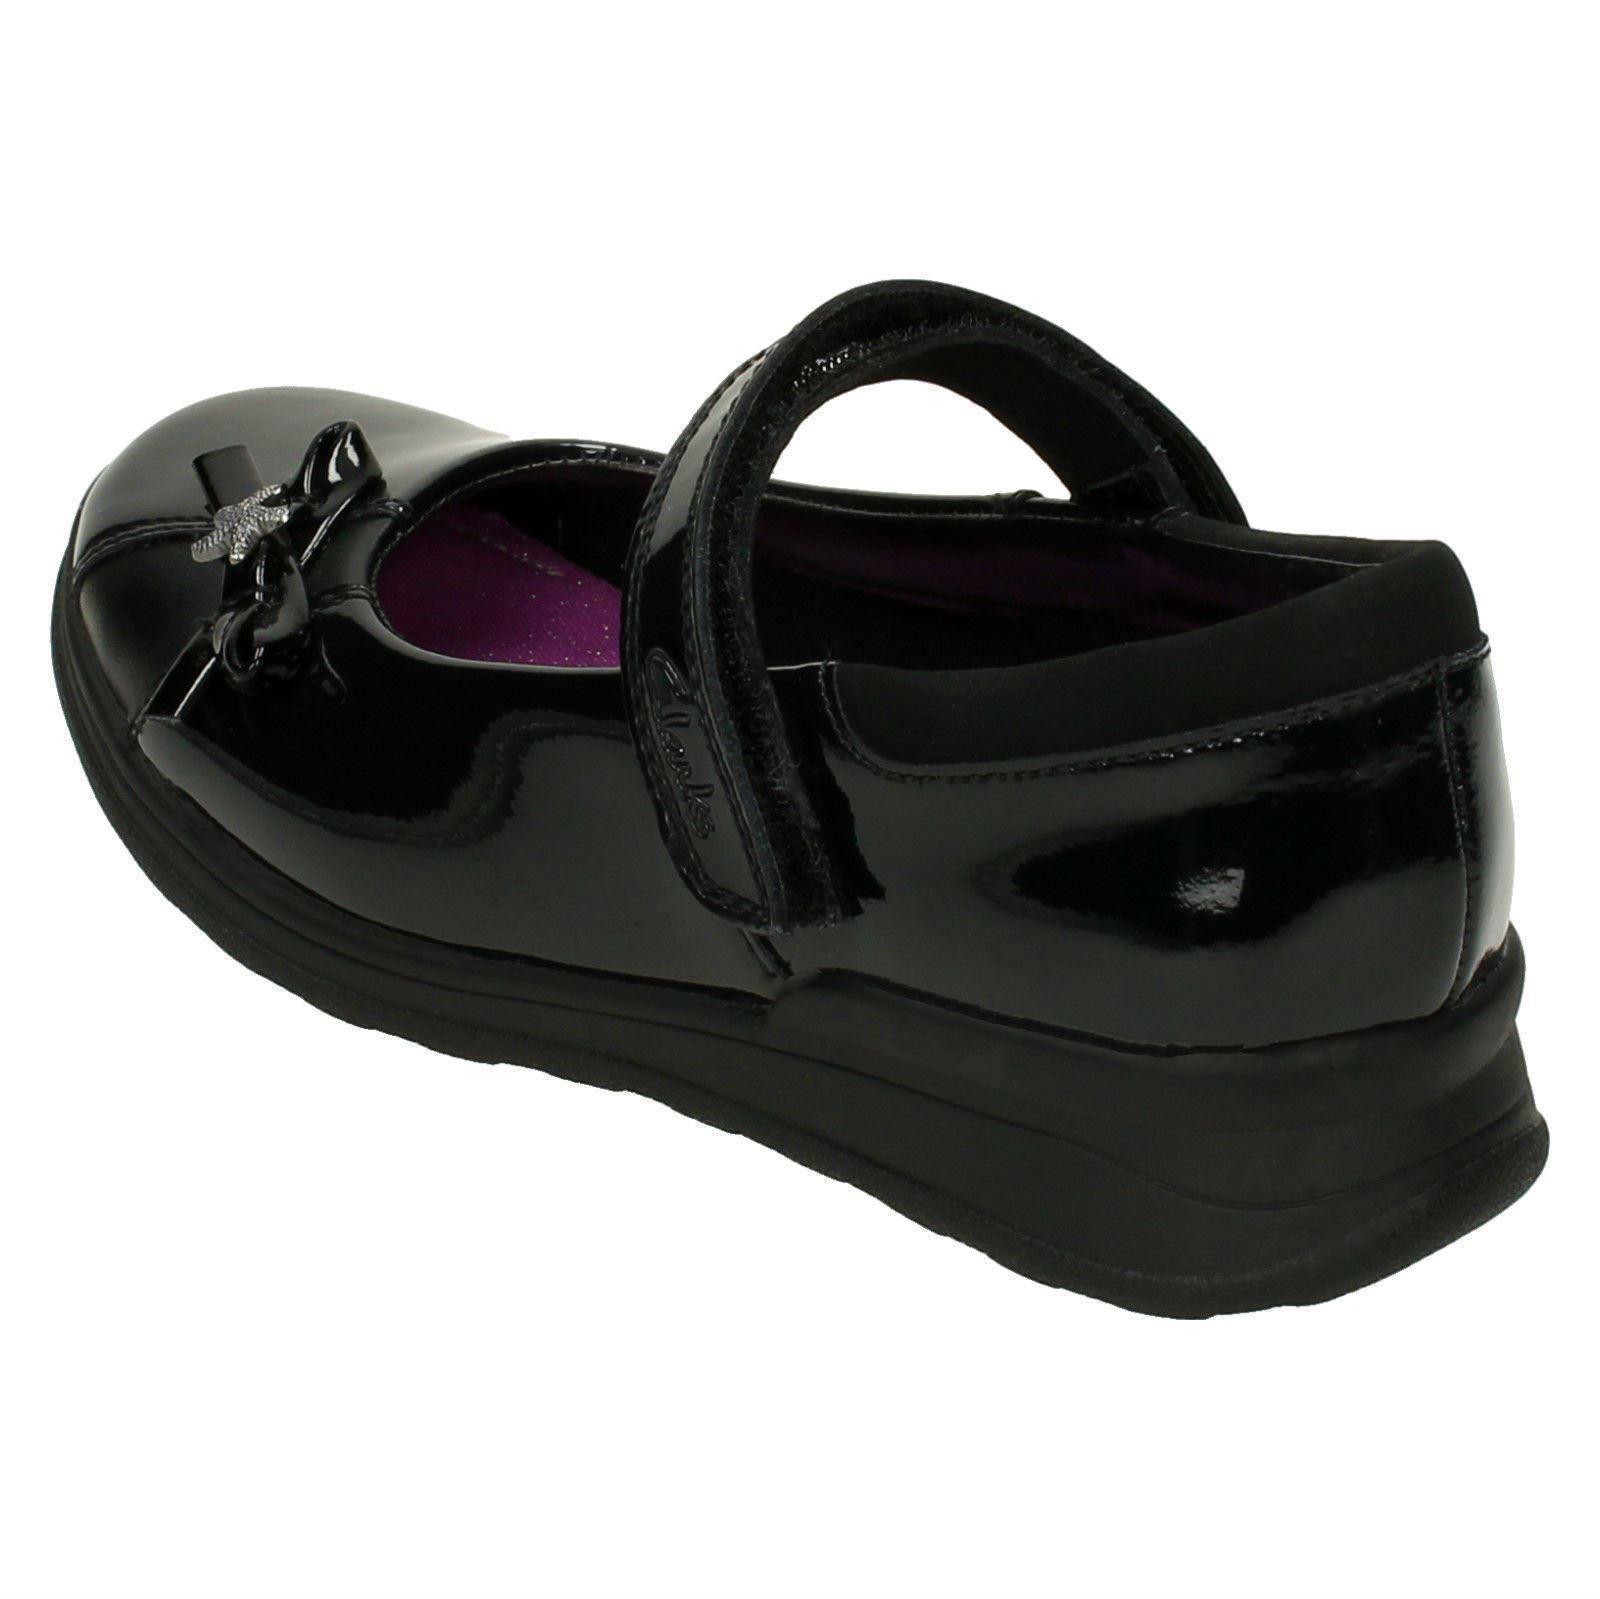 Girls Gloforms By Clarks School Shoes Mariel Wish Jnr